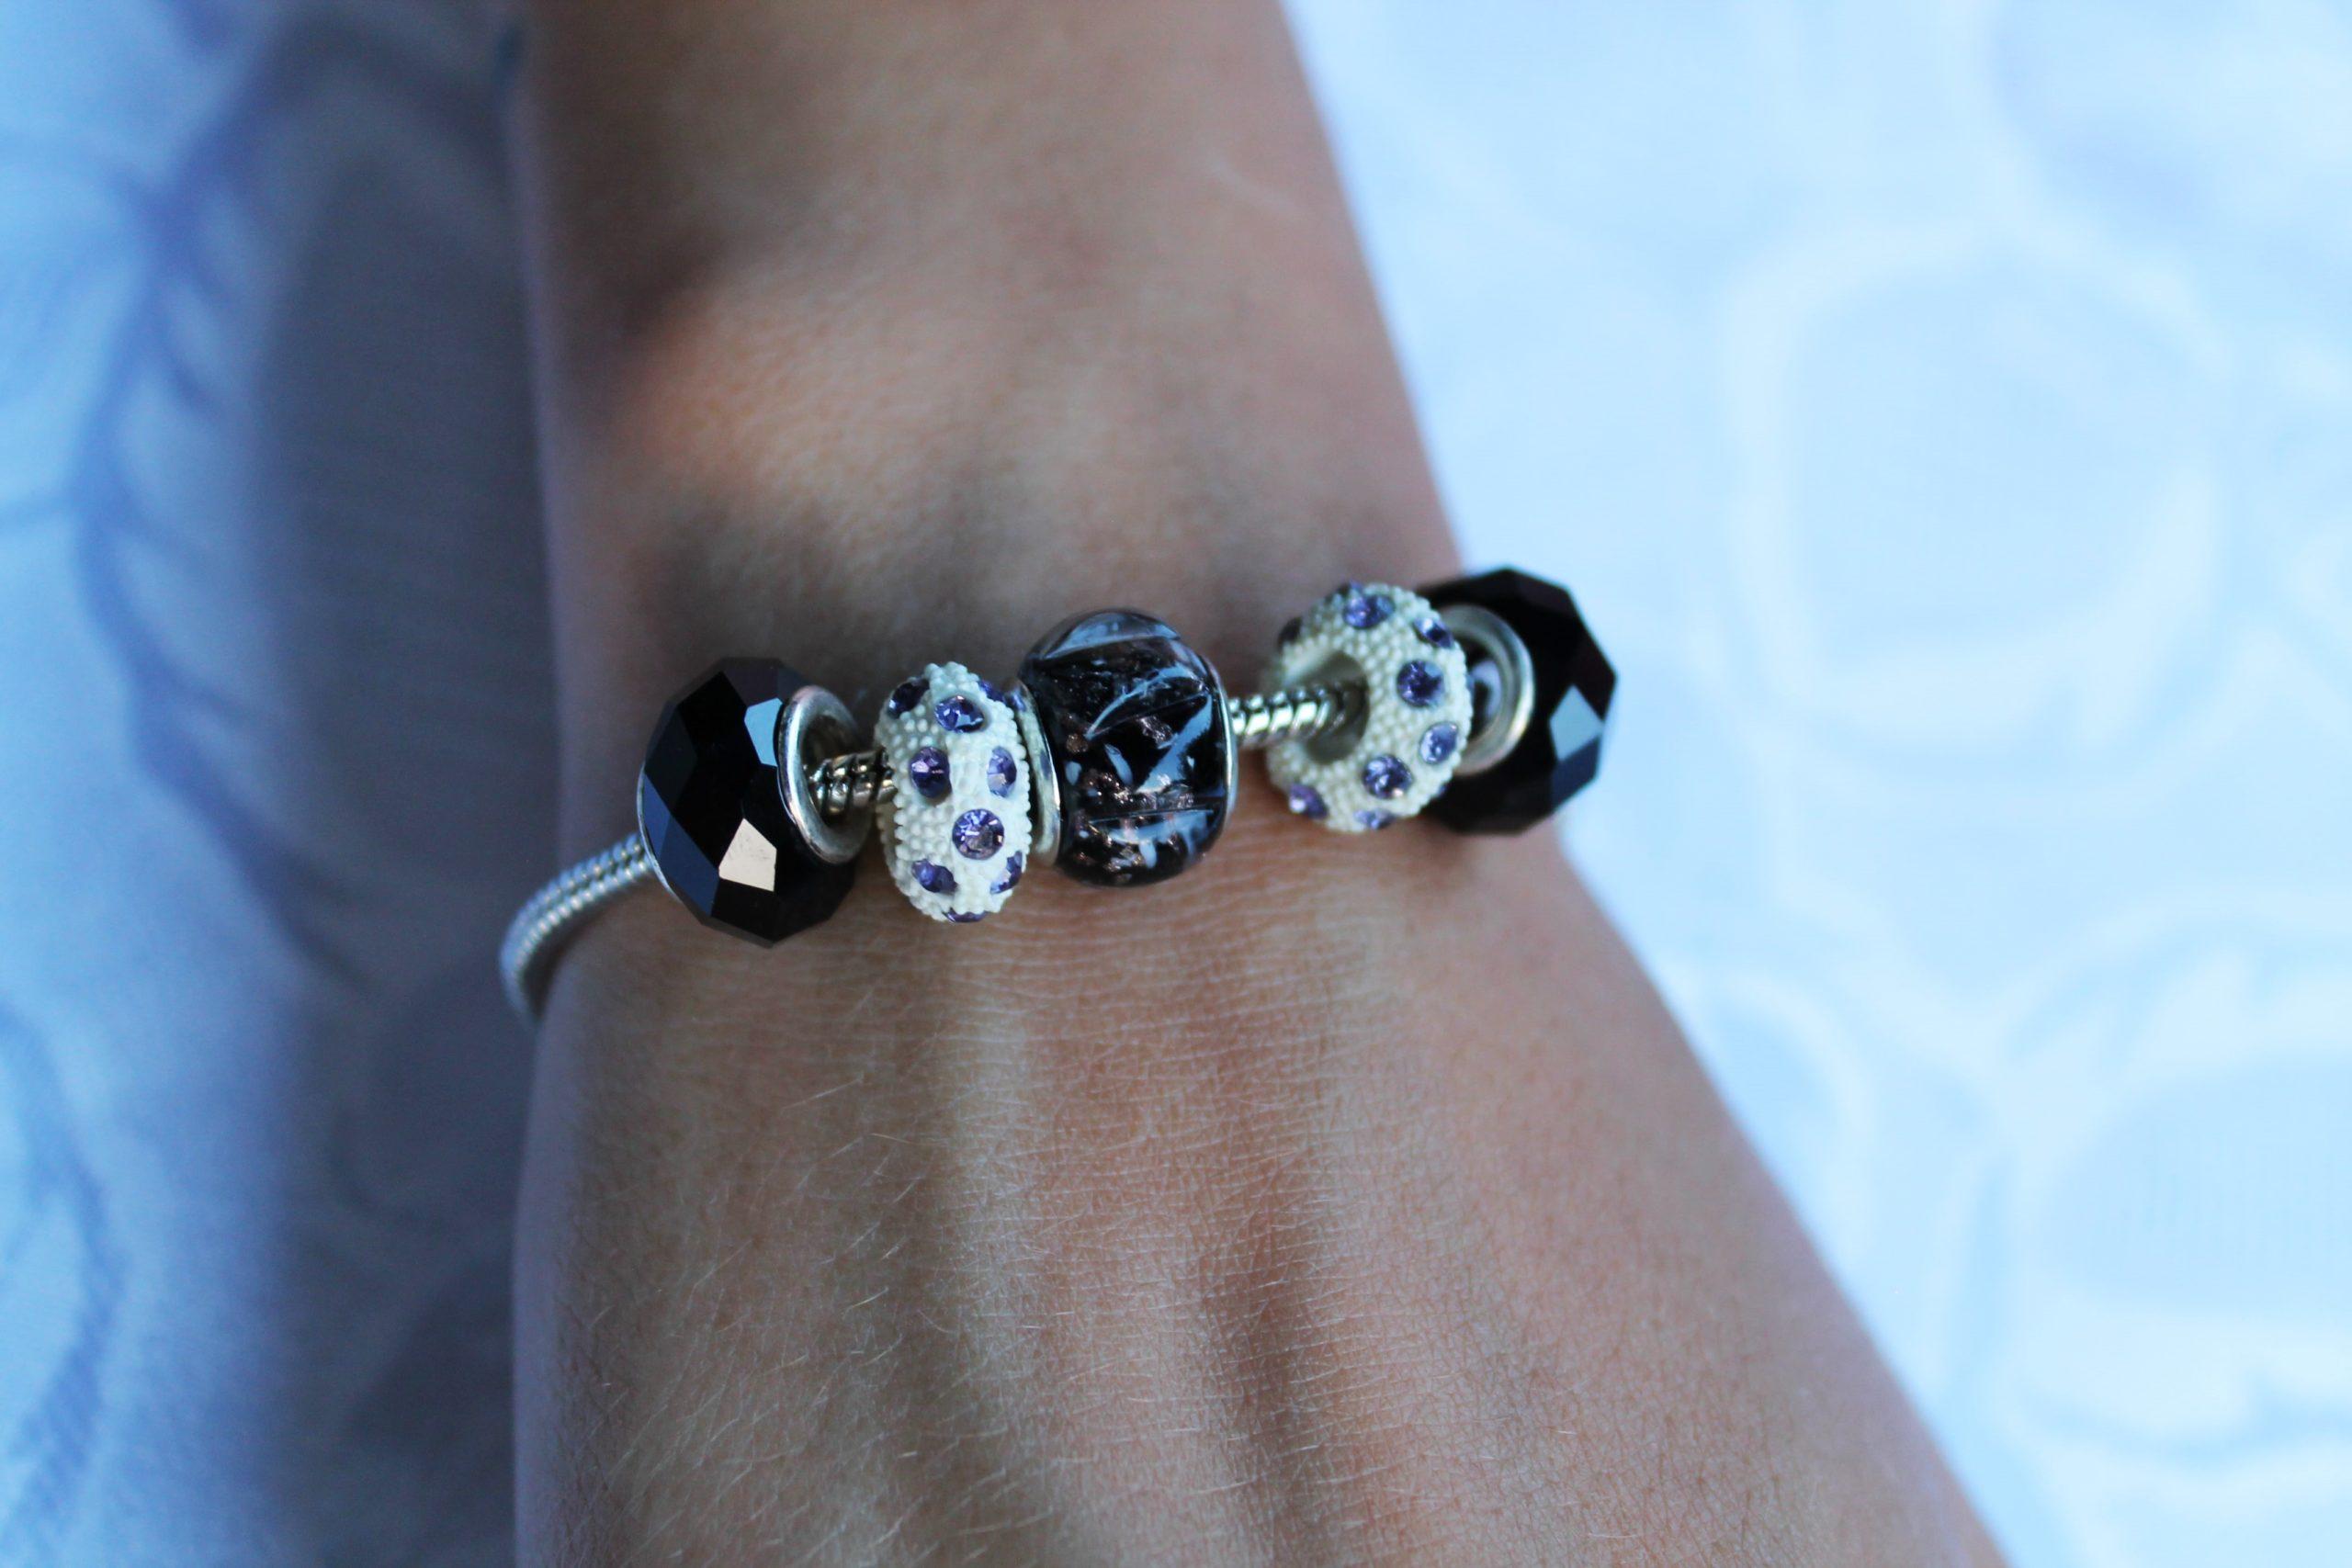 braccialetto simil pandora